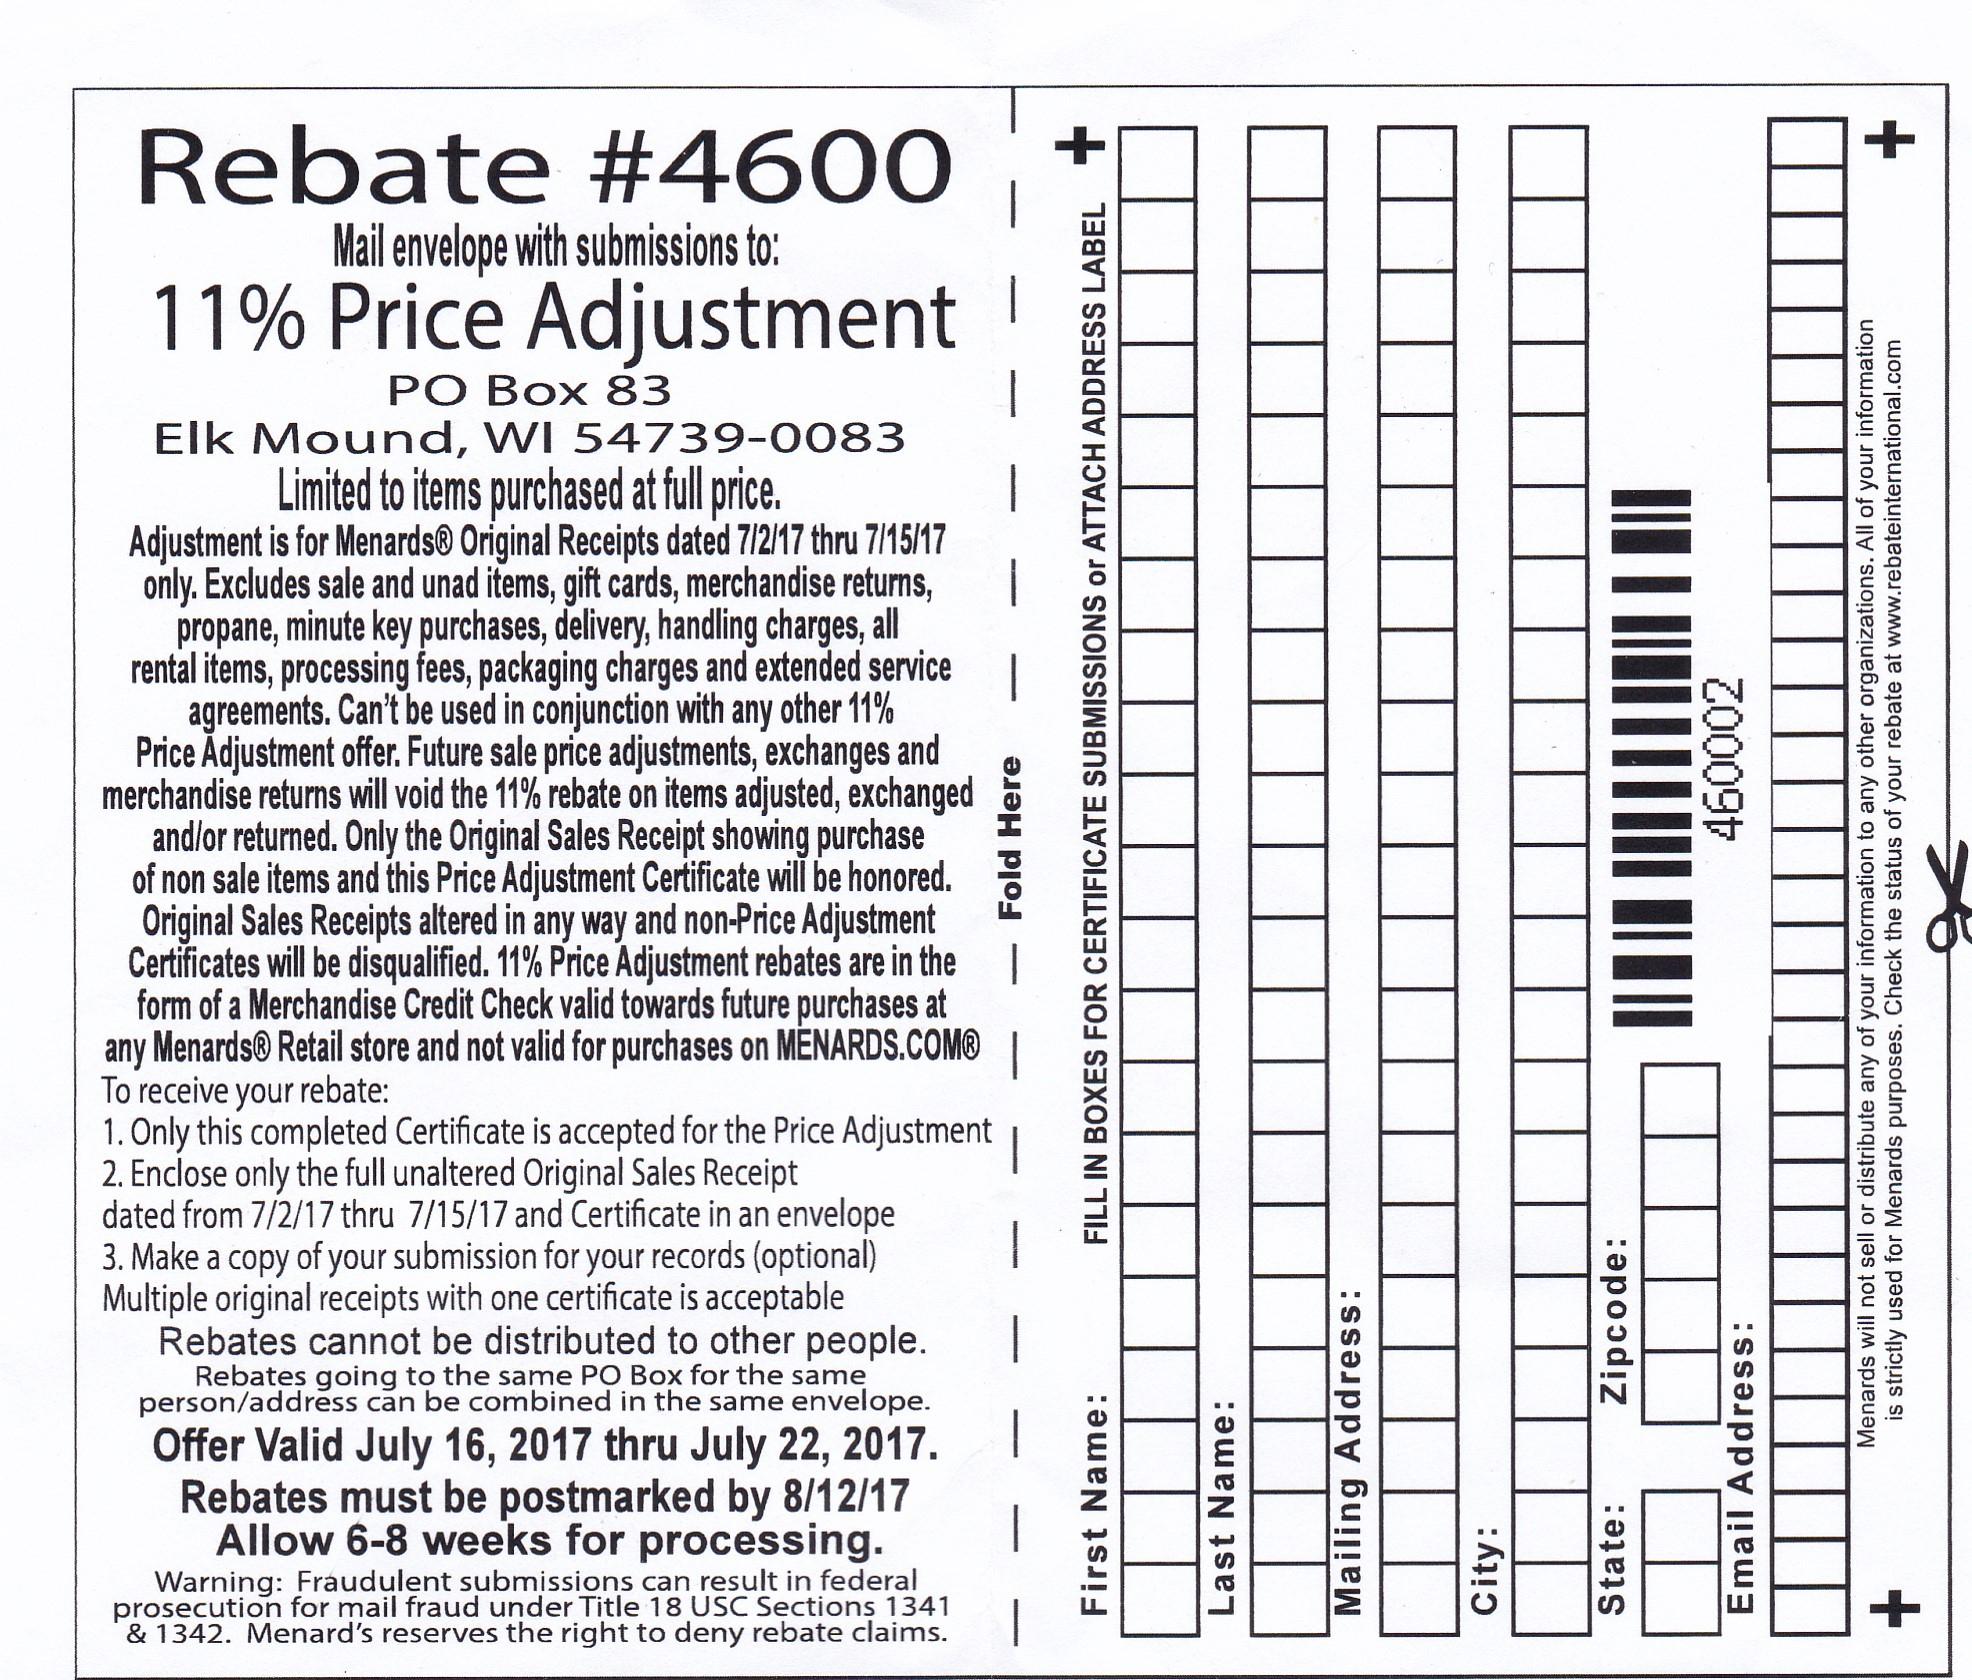 Menards Rebate Adjustment Form August 2021